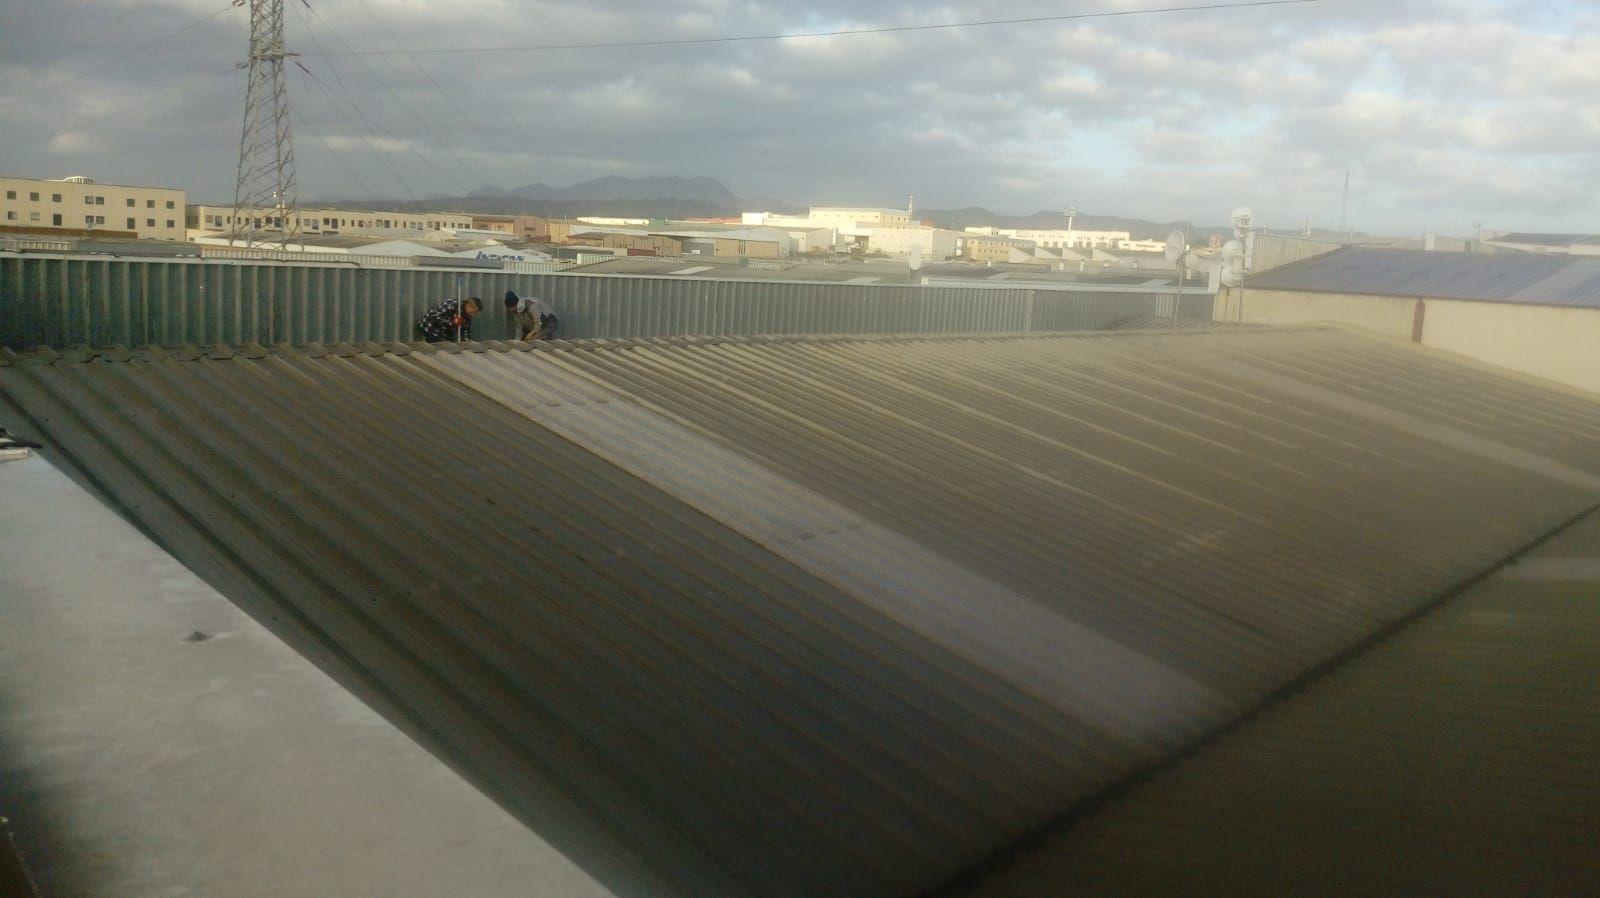 Limpieza e impermeabilizacion de Canalon en nave industrial